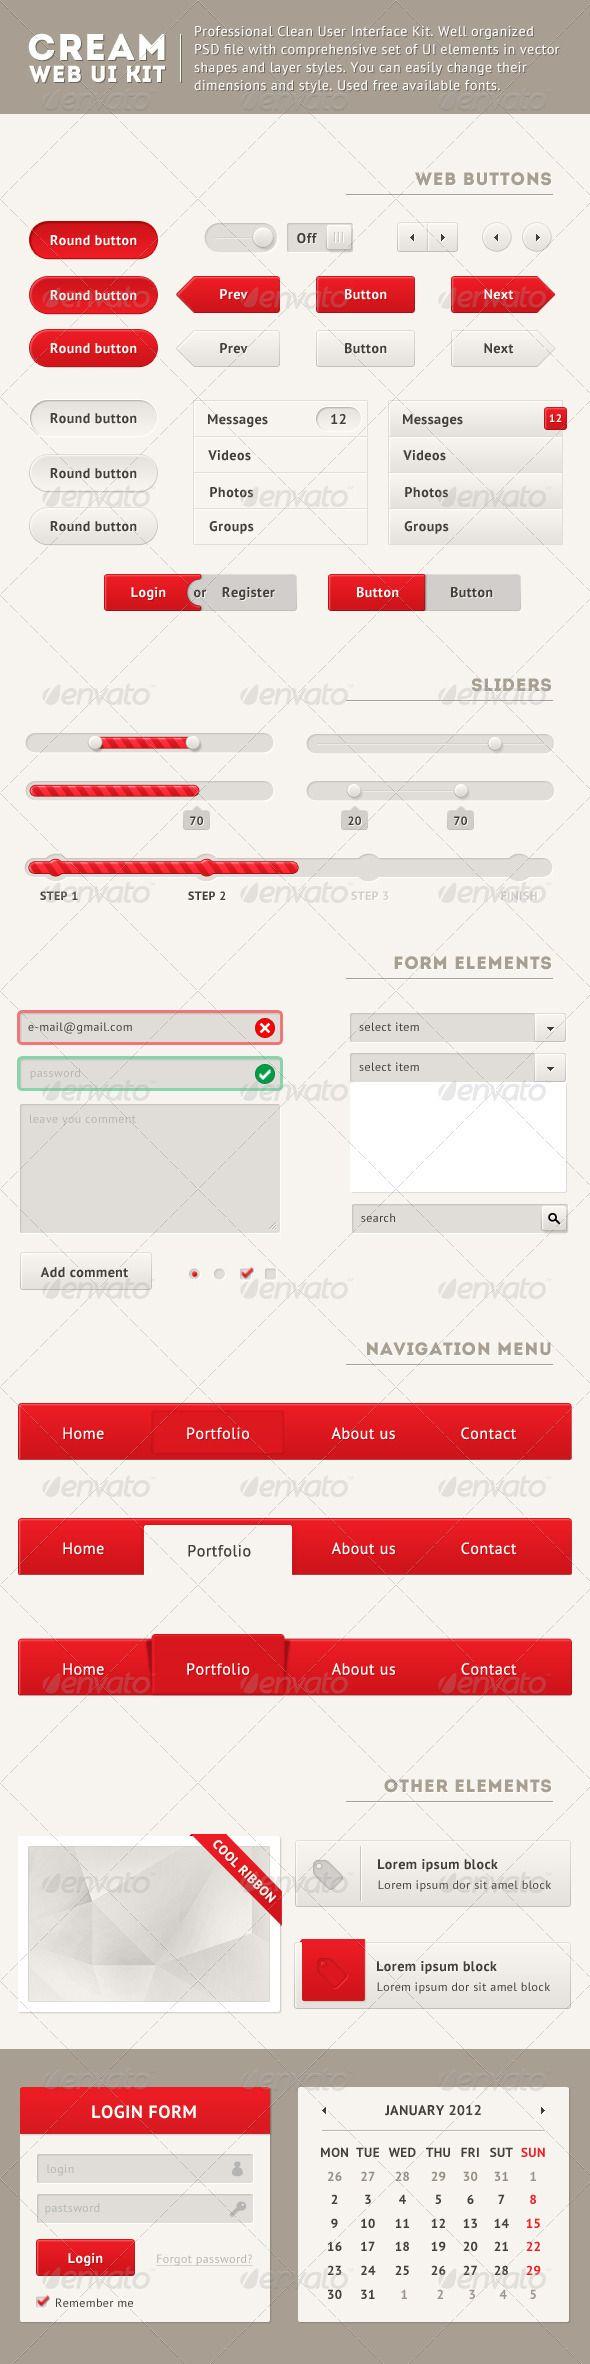 Clean Web UI Kit - #User #Interfaces #Web Elements Download here: https://graphicriver.net/item/clean-web-ui-kit/2473832?ref=alena994